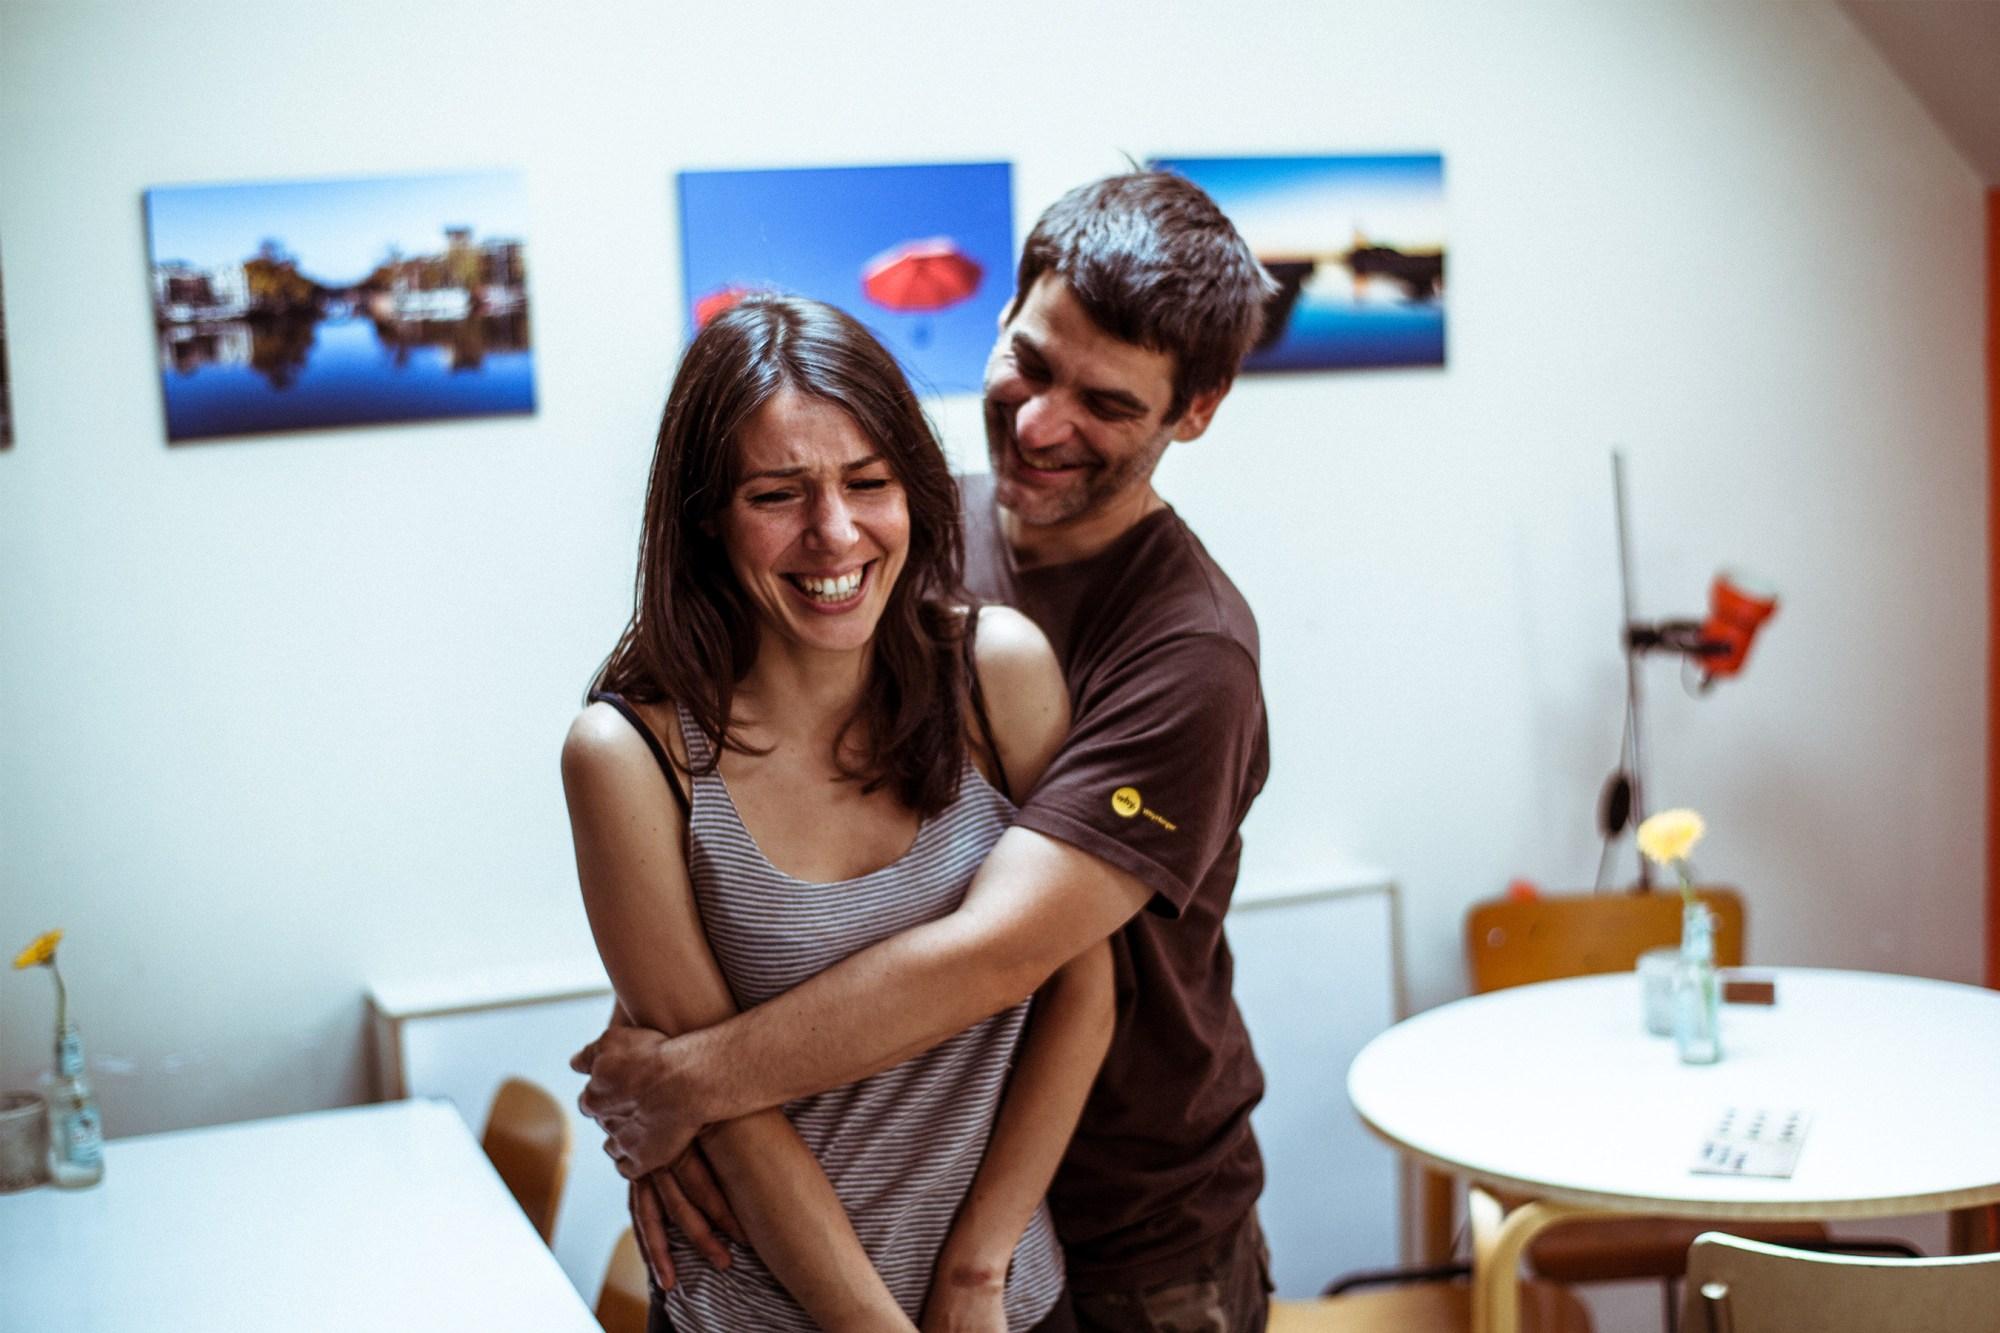 Eigenaars Matthias en Samantha van La Fucina